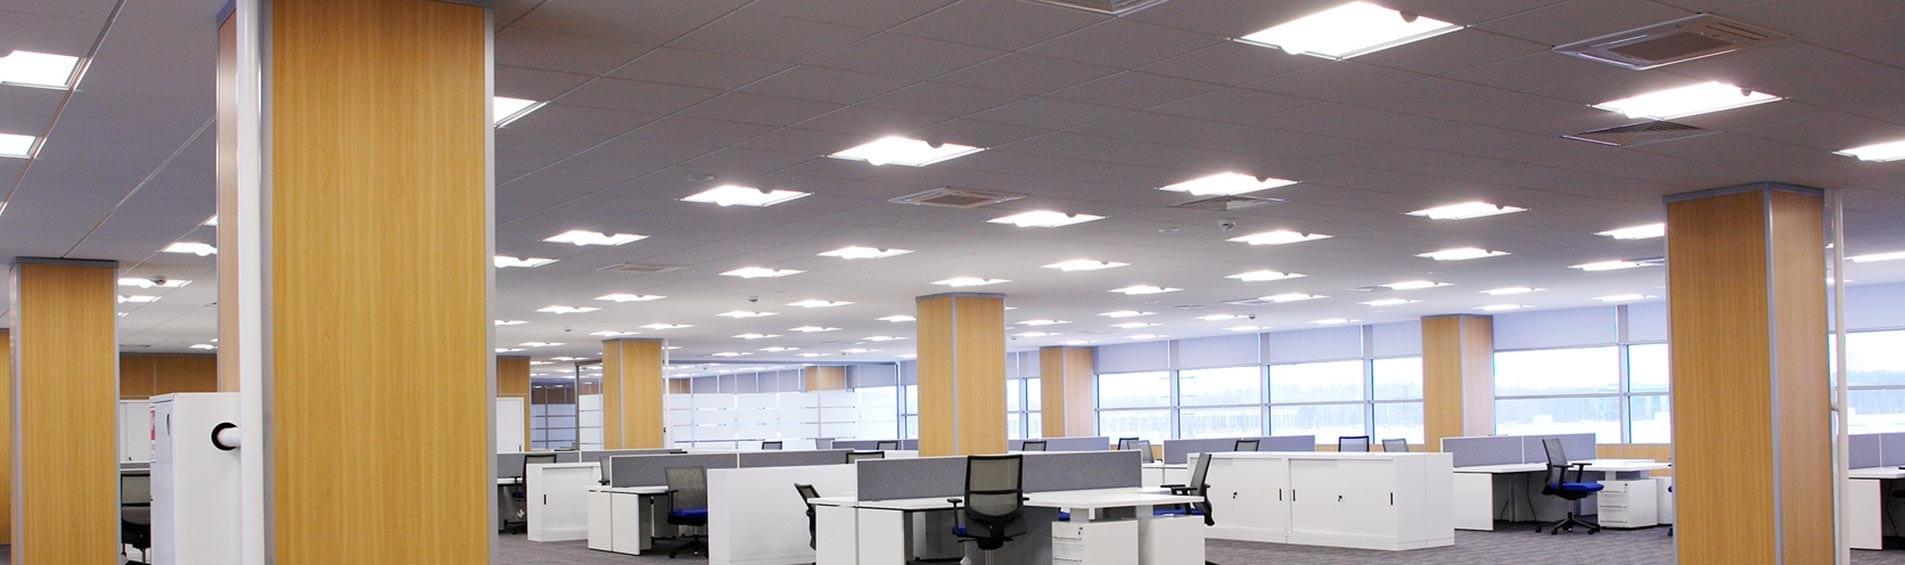 Green Lighting Consulting Office Lighting